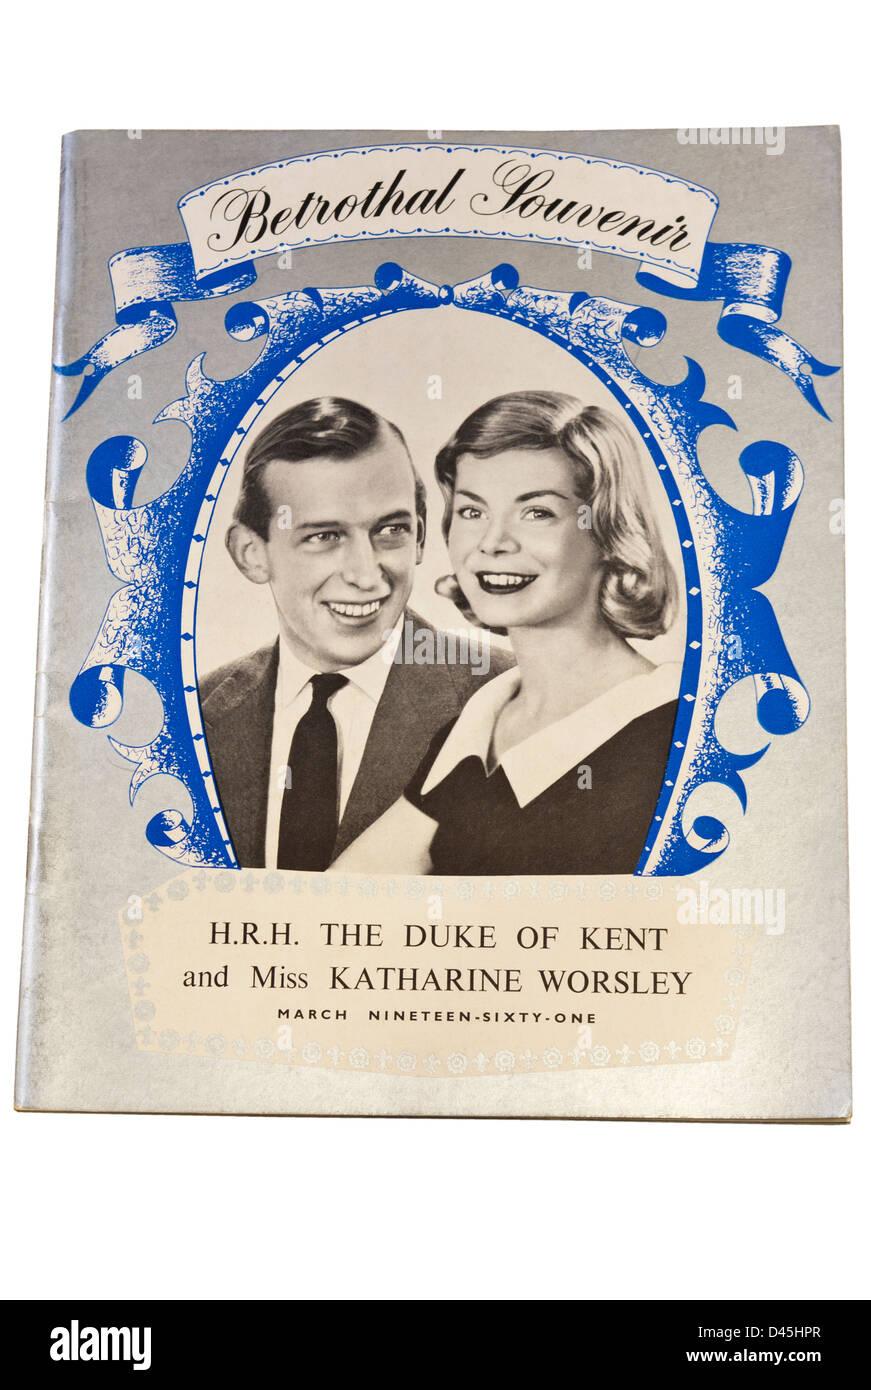 Betrothal Souvenir H.R.H The Duke Of Kent and Miss Katharine Worsley - Stock Image